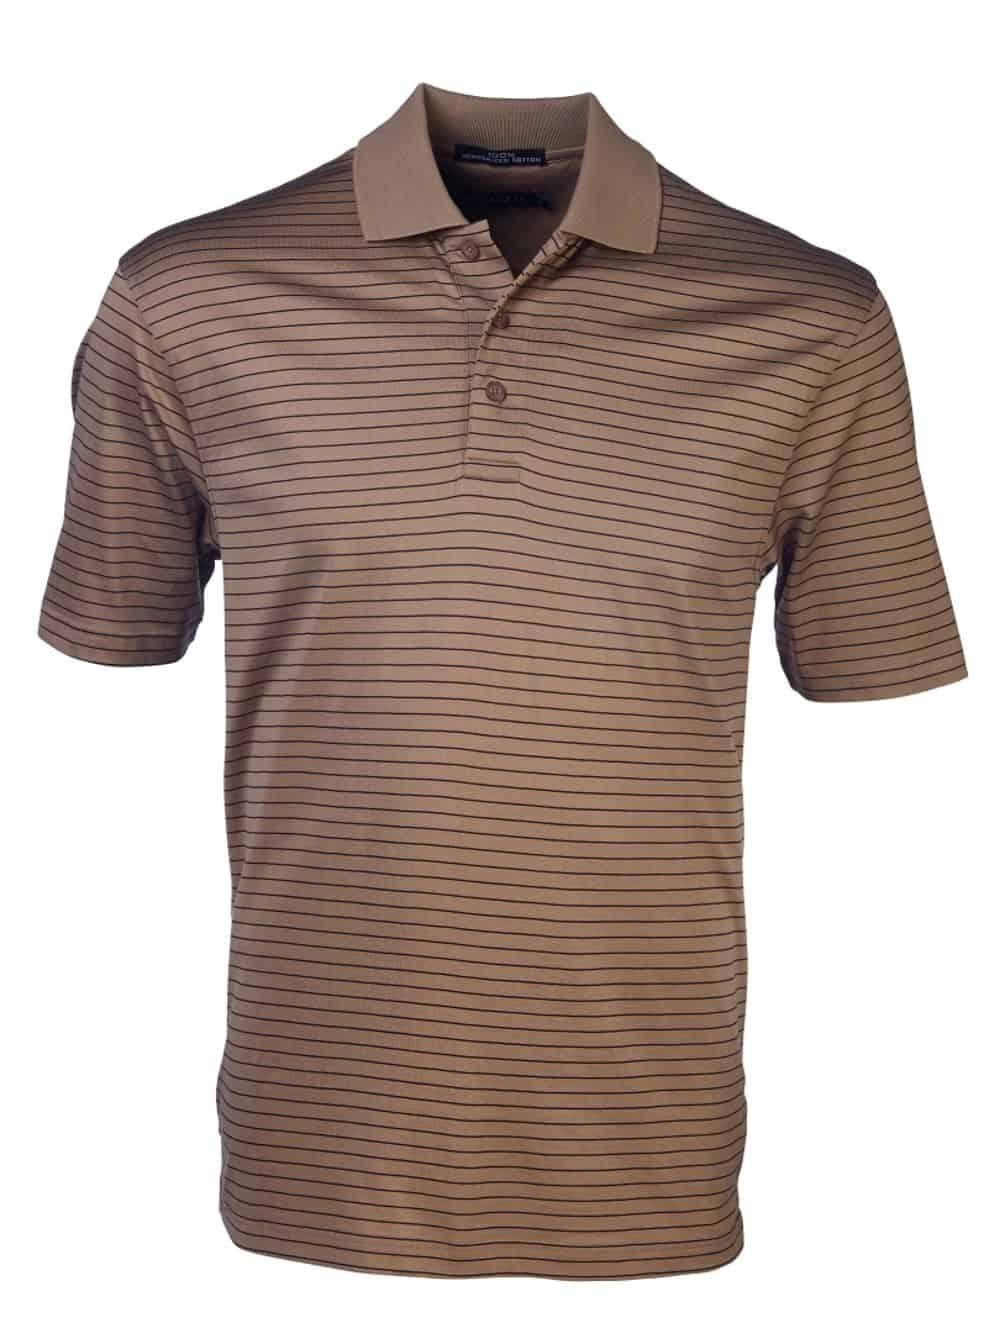 180G Double Mercerized Yarn Dyed Golfer Golf Shirts